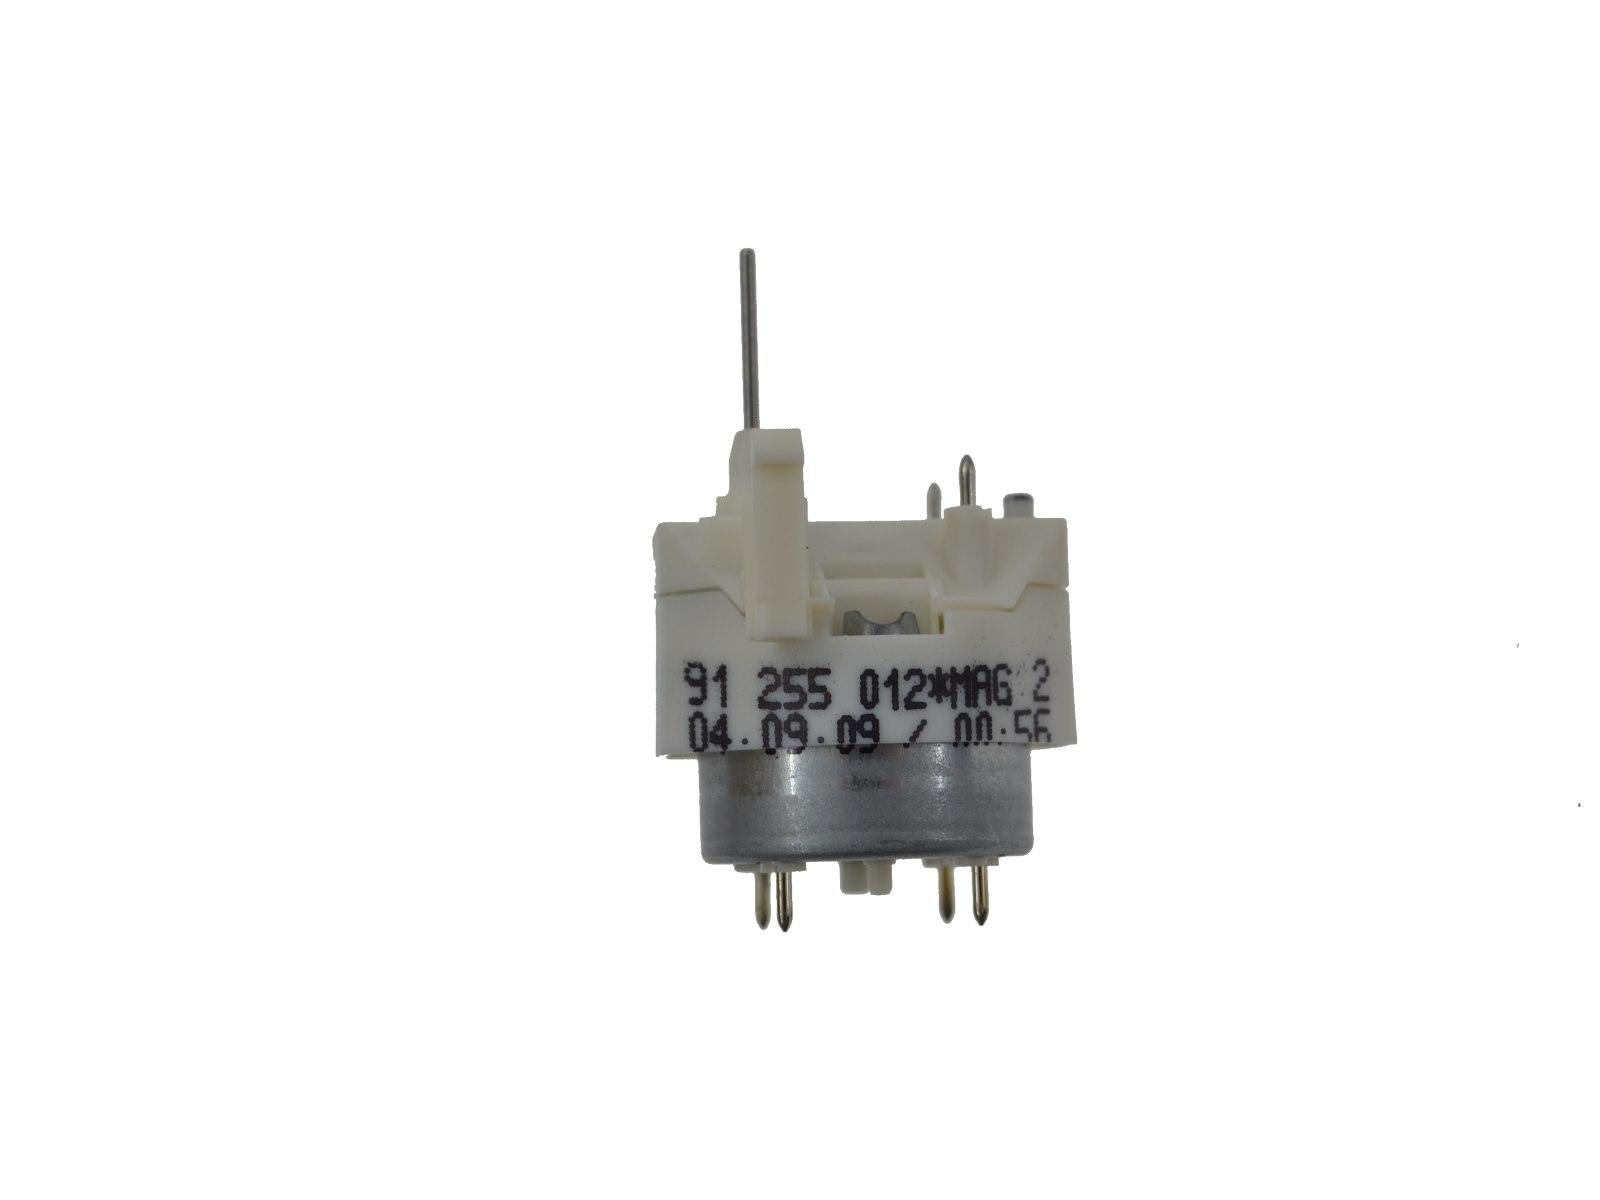 Stepper motor for VW Sharan / 7M Polo / 9N Instrument cluster engine Nr -12